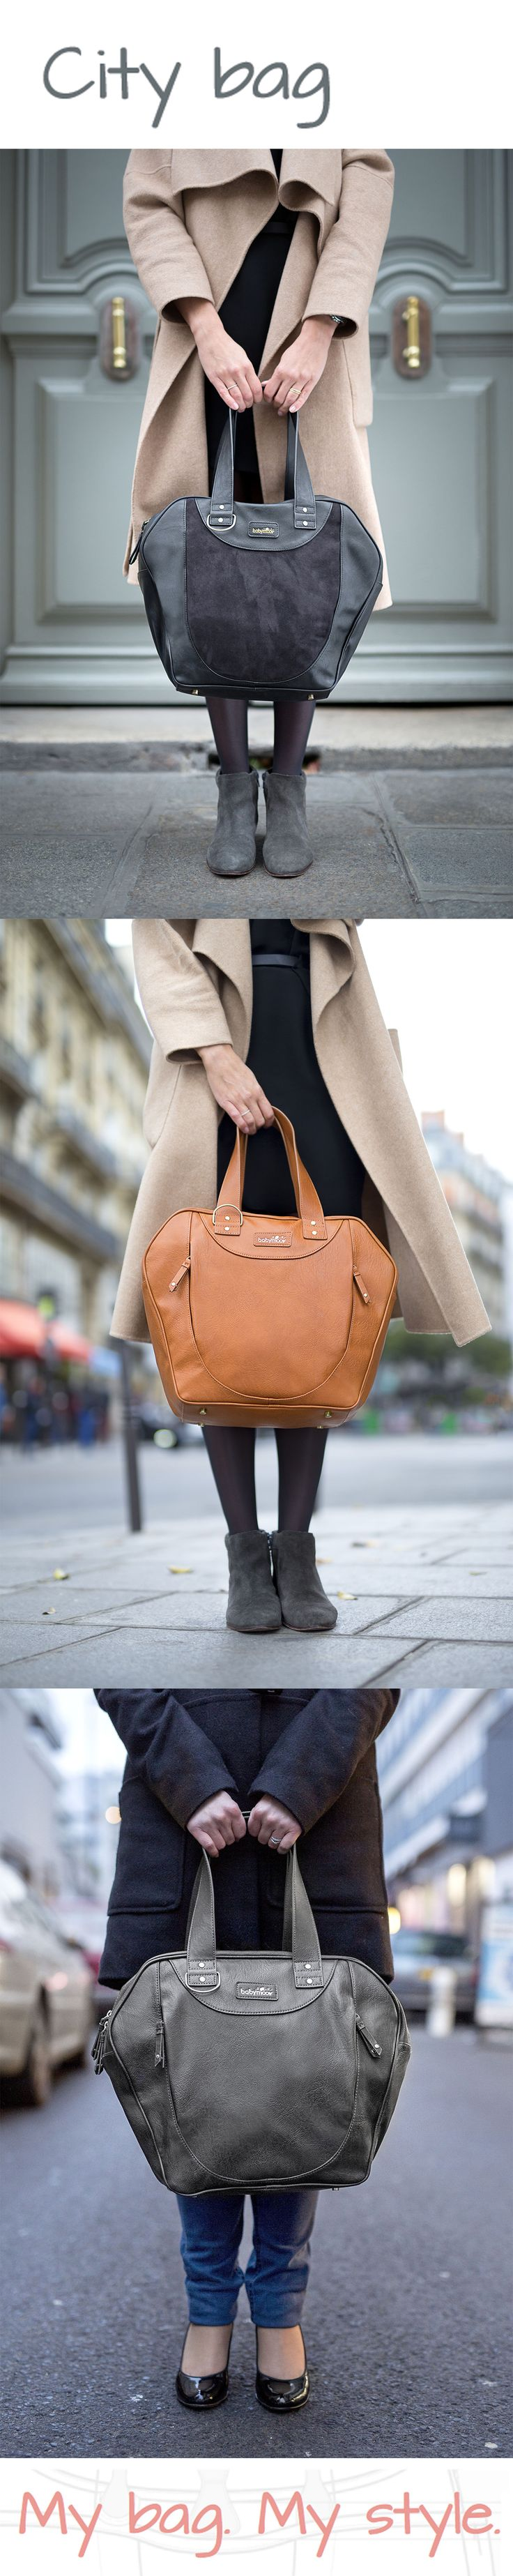 City Bag #Changing Bag #Babymoov #MyBagMyStyle #FashionMum #elegant #look #ItBag